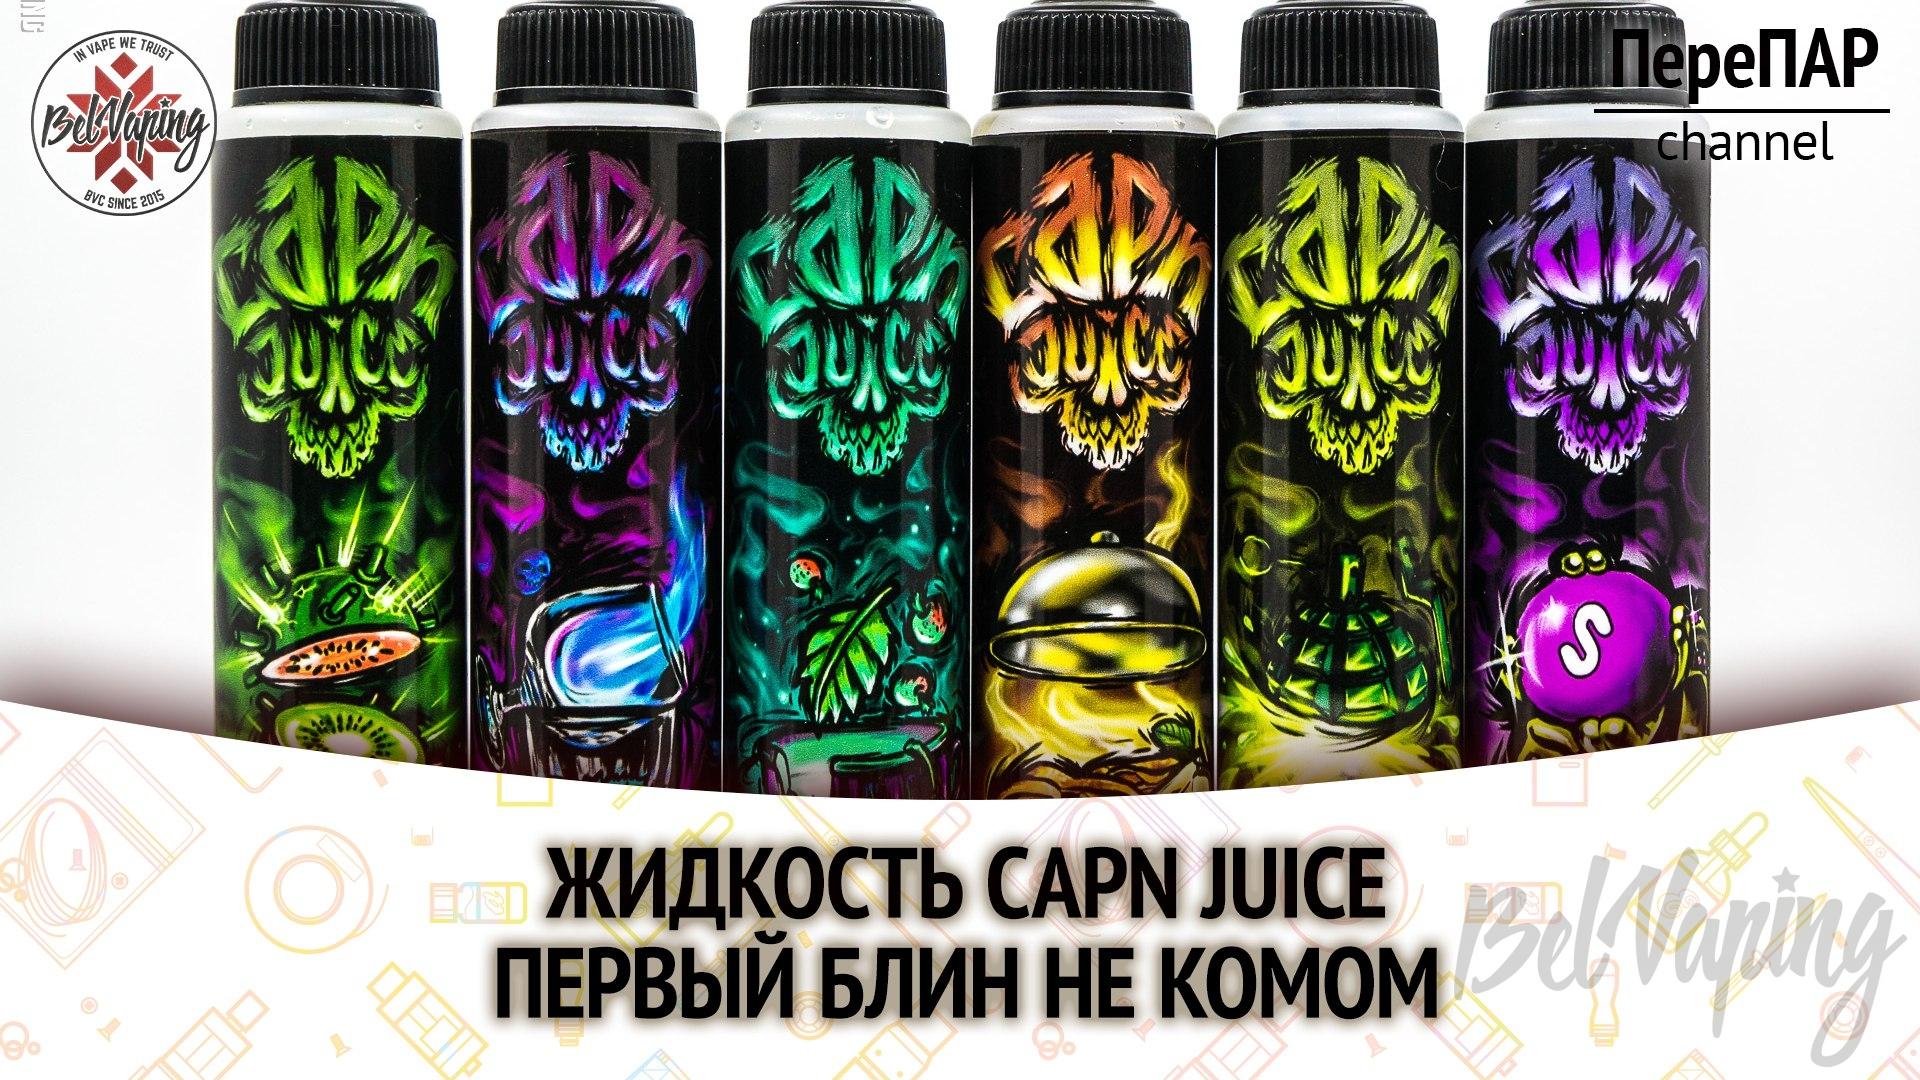 Жидкости Cap'n Juice